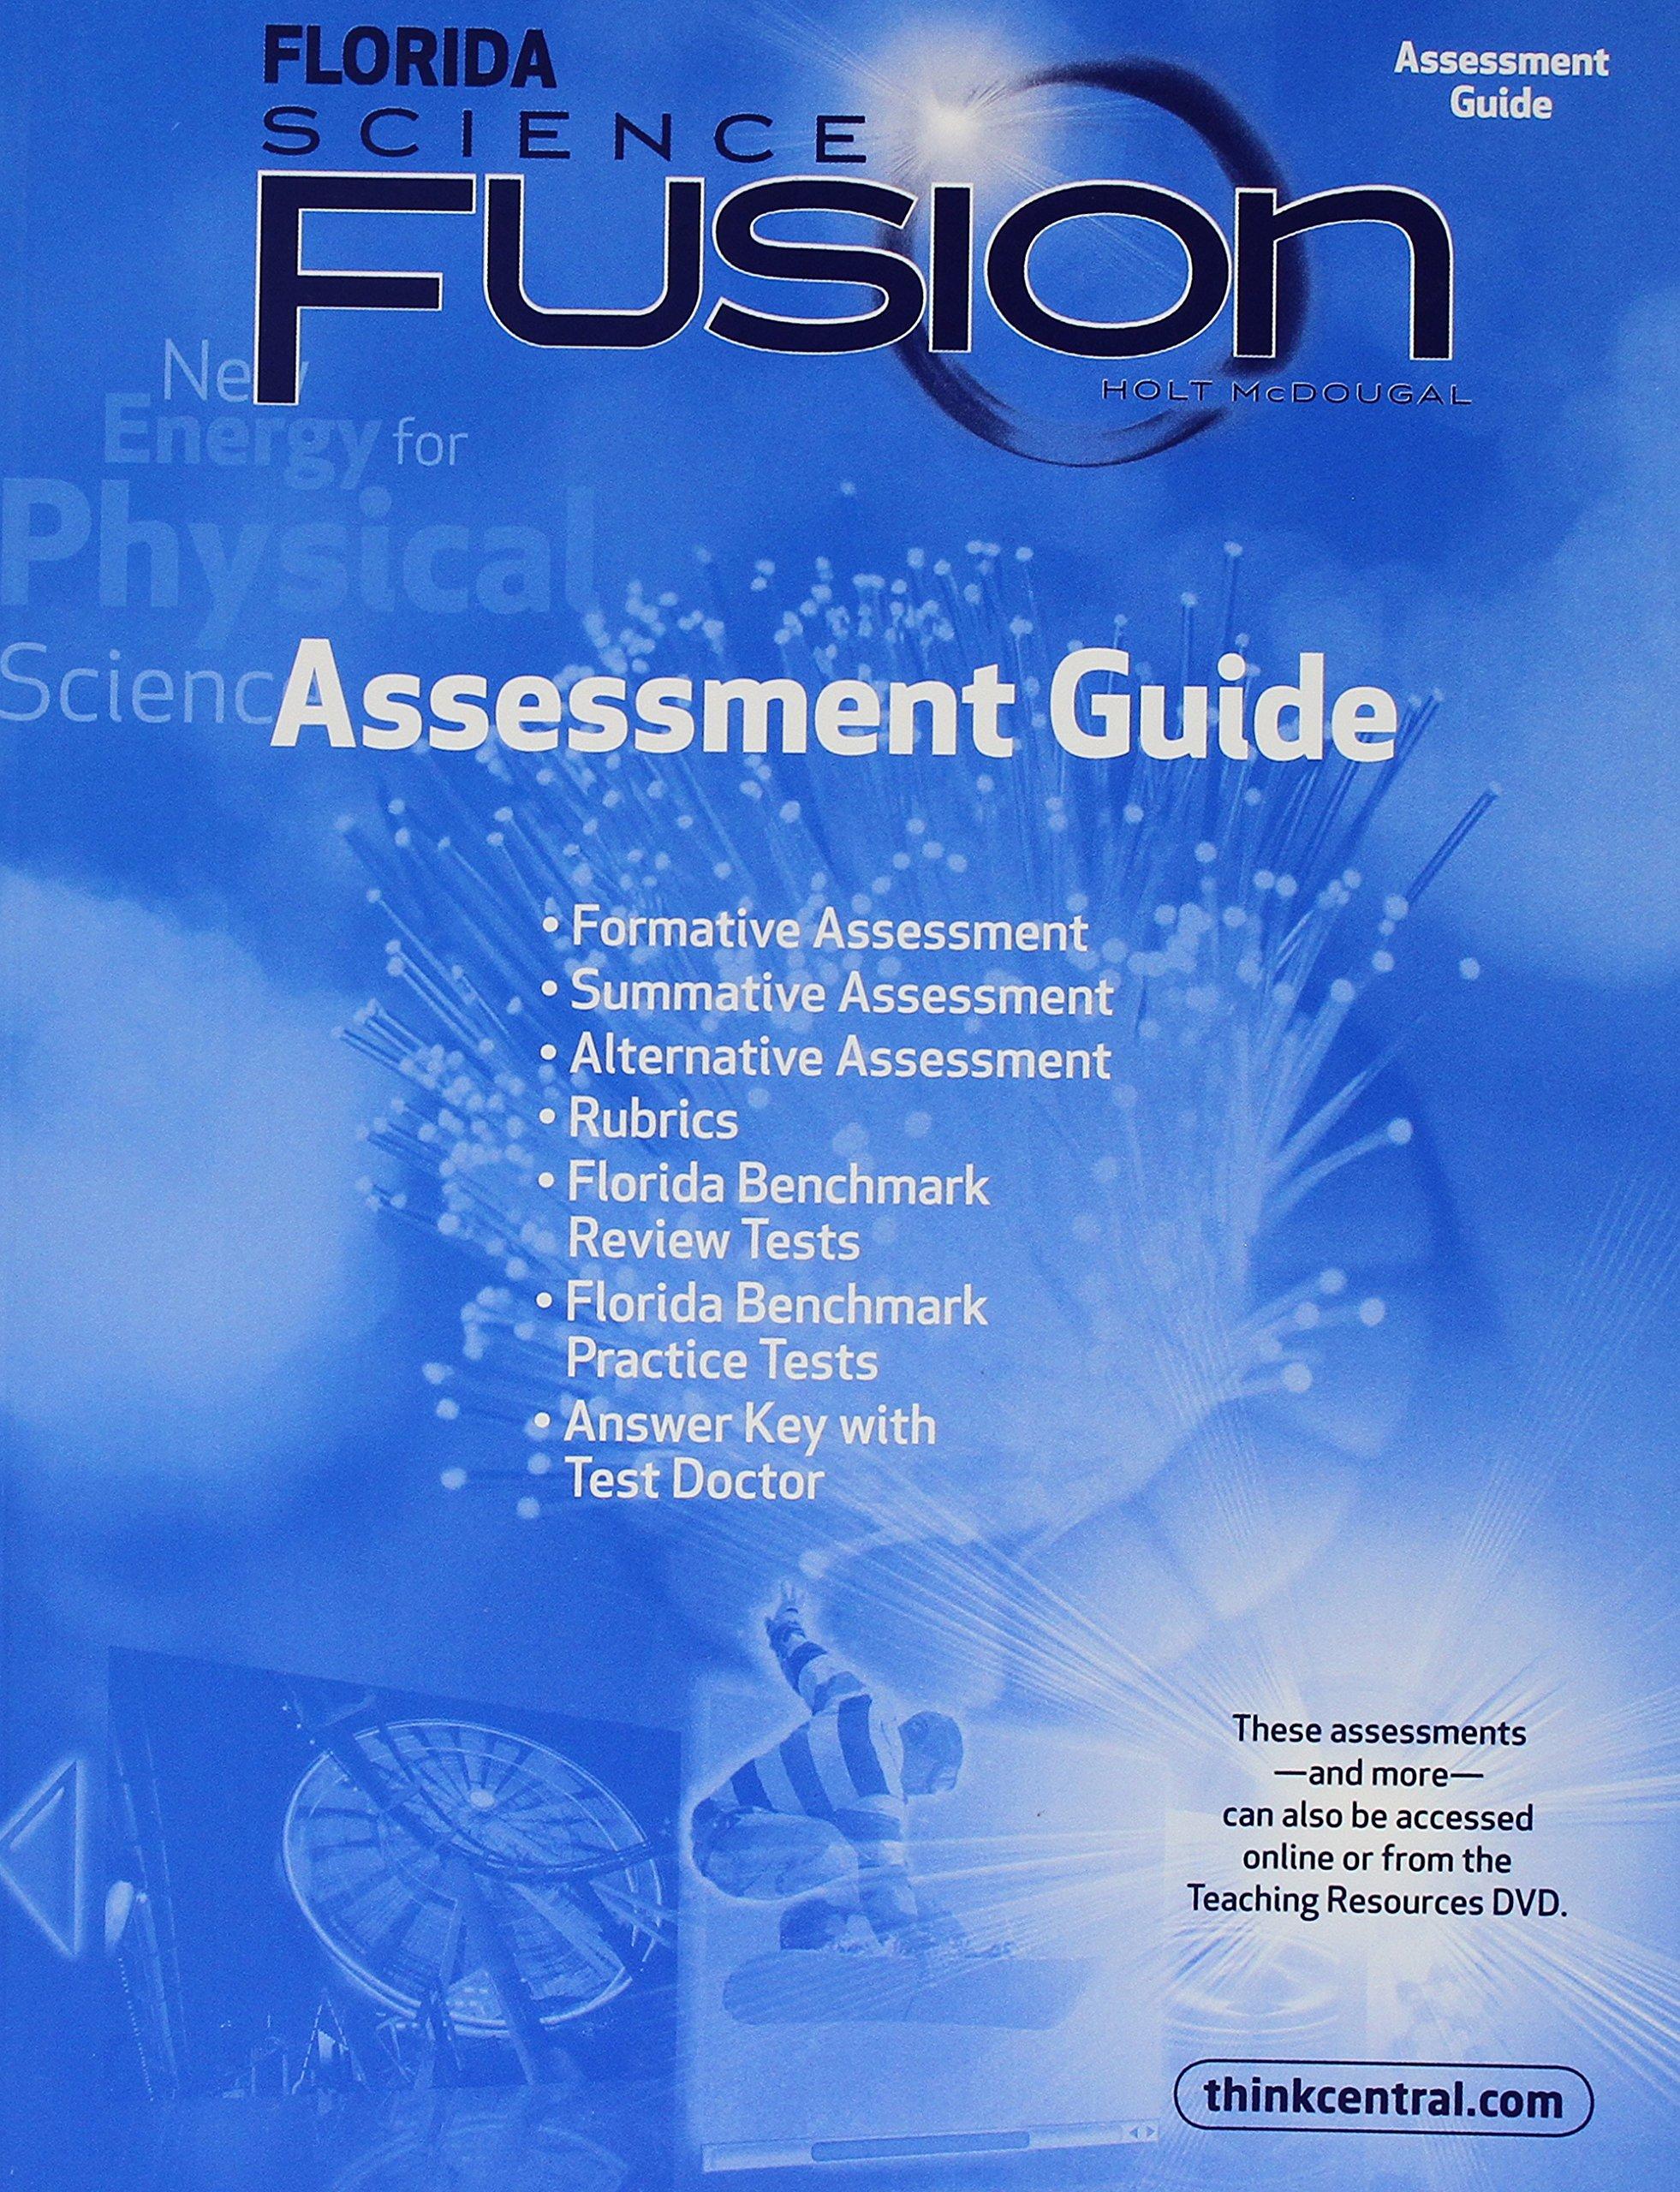 Holt McDougal Science Fusion Florida: Assessment Guide Grades 6-8 Physcial: HOUGHTON  MIFFLIN HARCOURT: 9780547398945: Amazon.com: Books